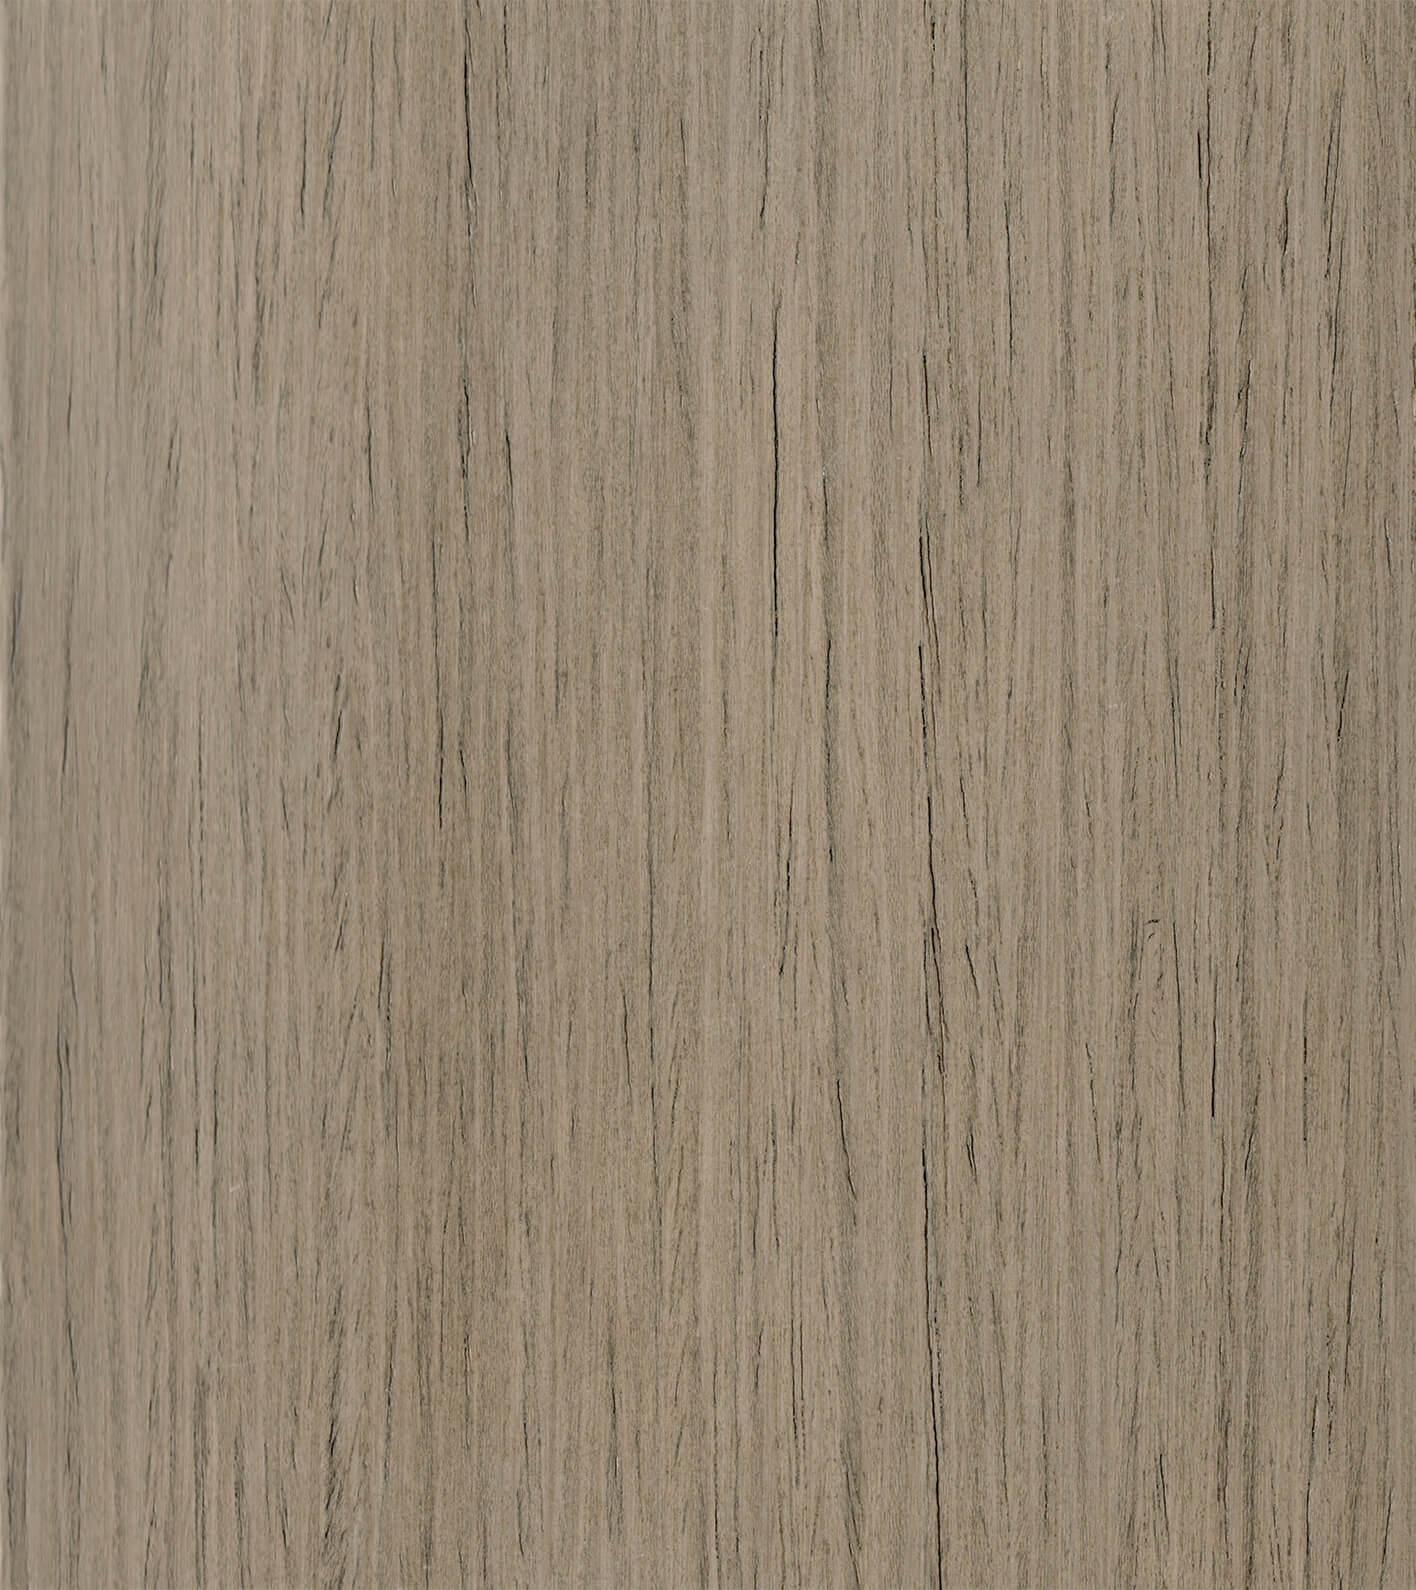 Cashew Stain on Straight Grain Oak Exotic Veneer